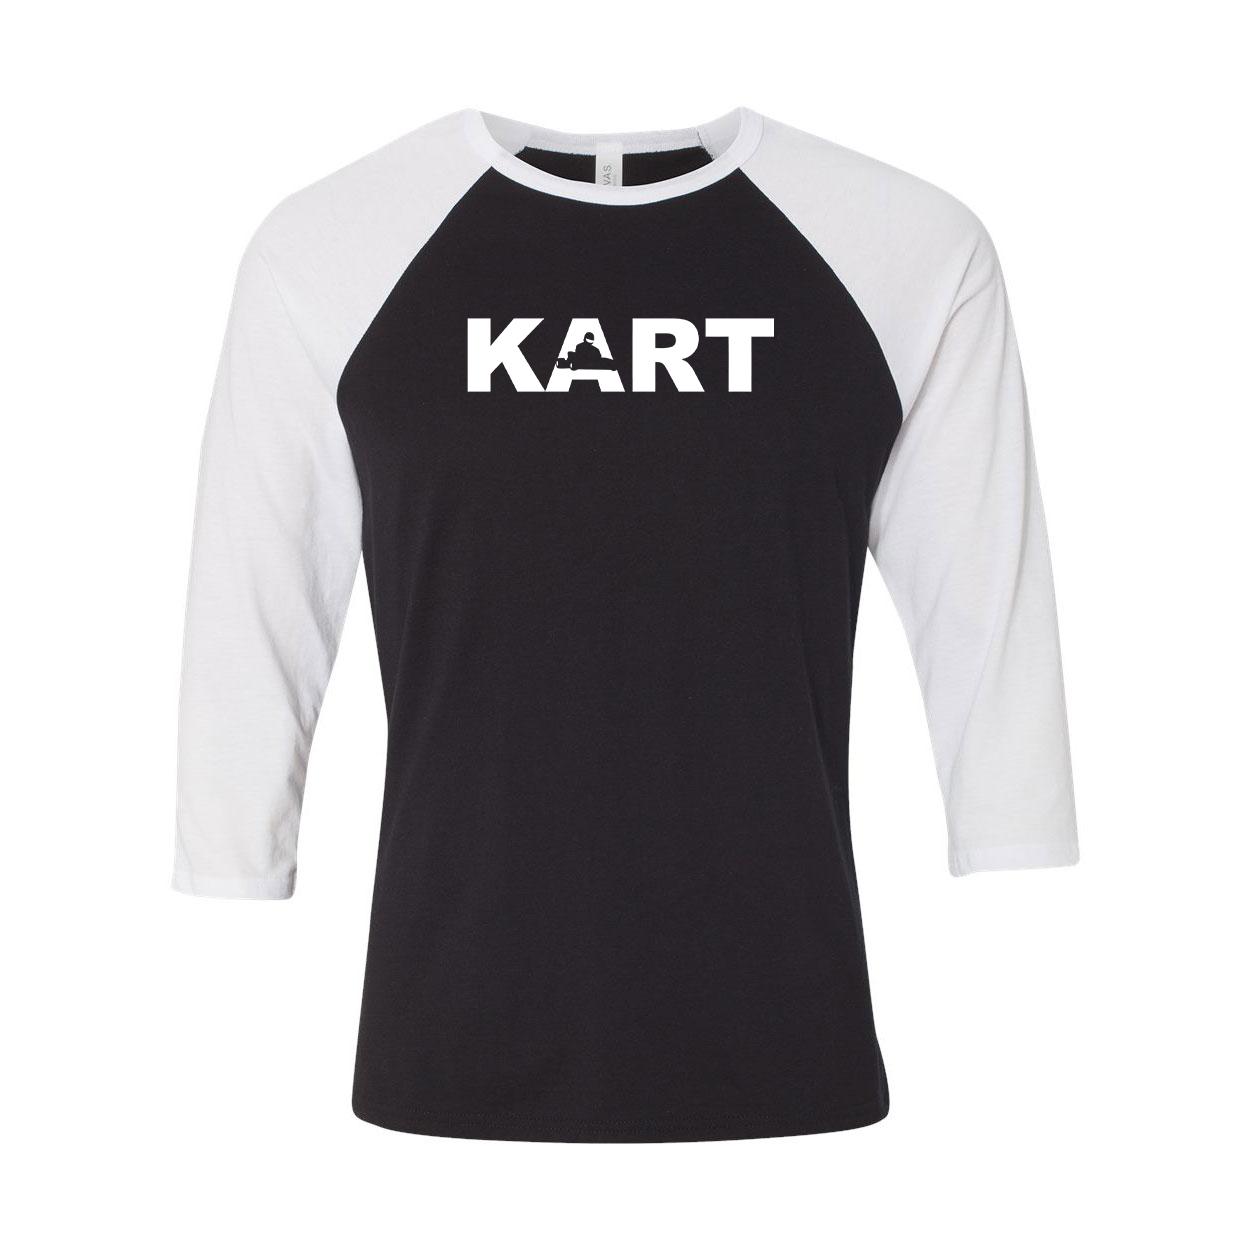 Kart Racer Logo Classic Raglan Shirt Black/White (White Logo)